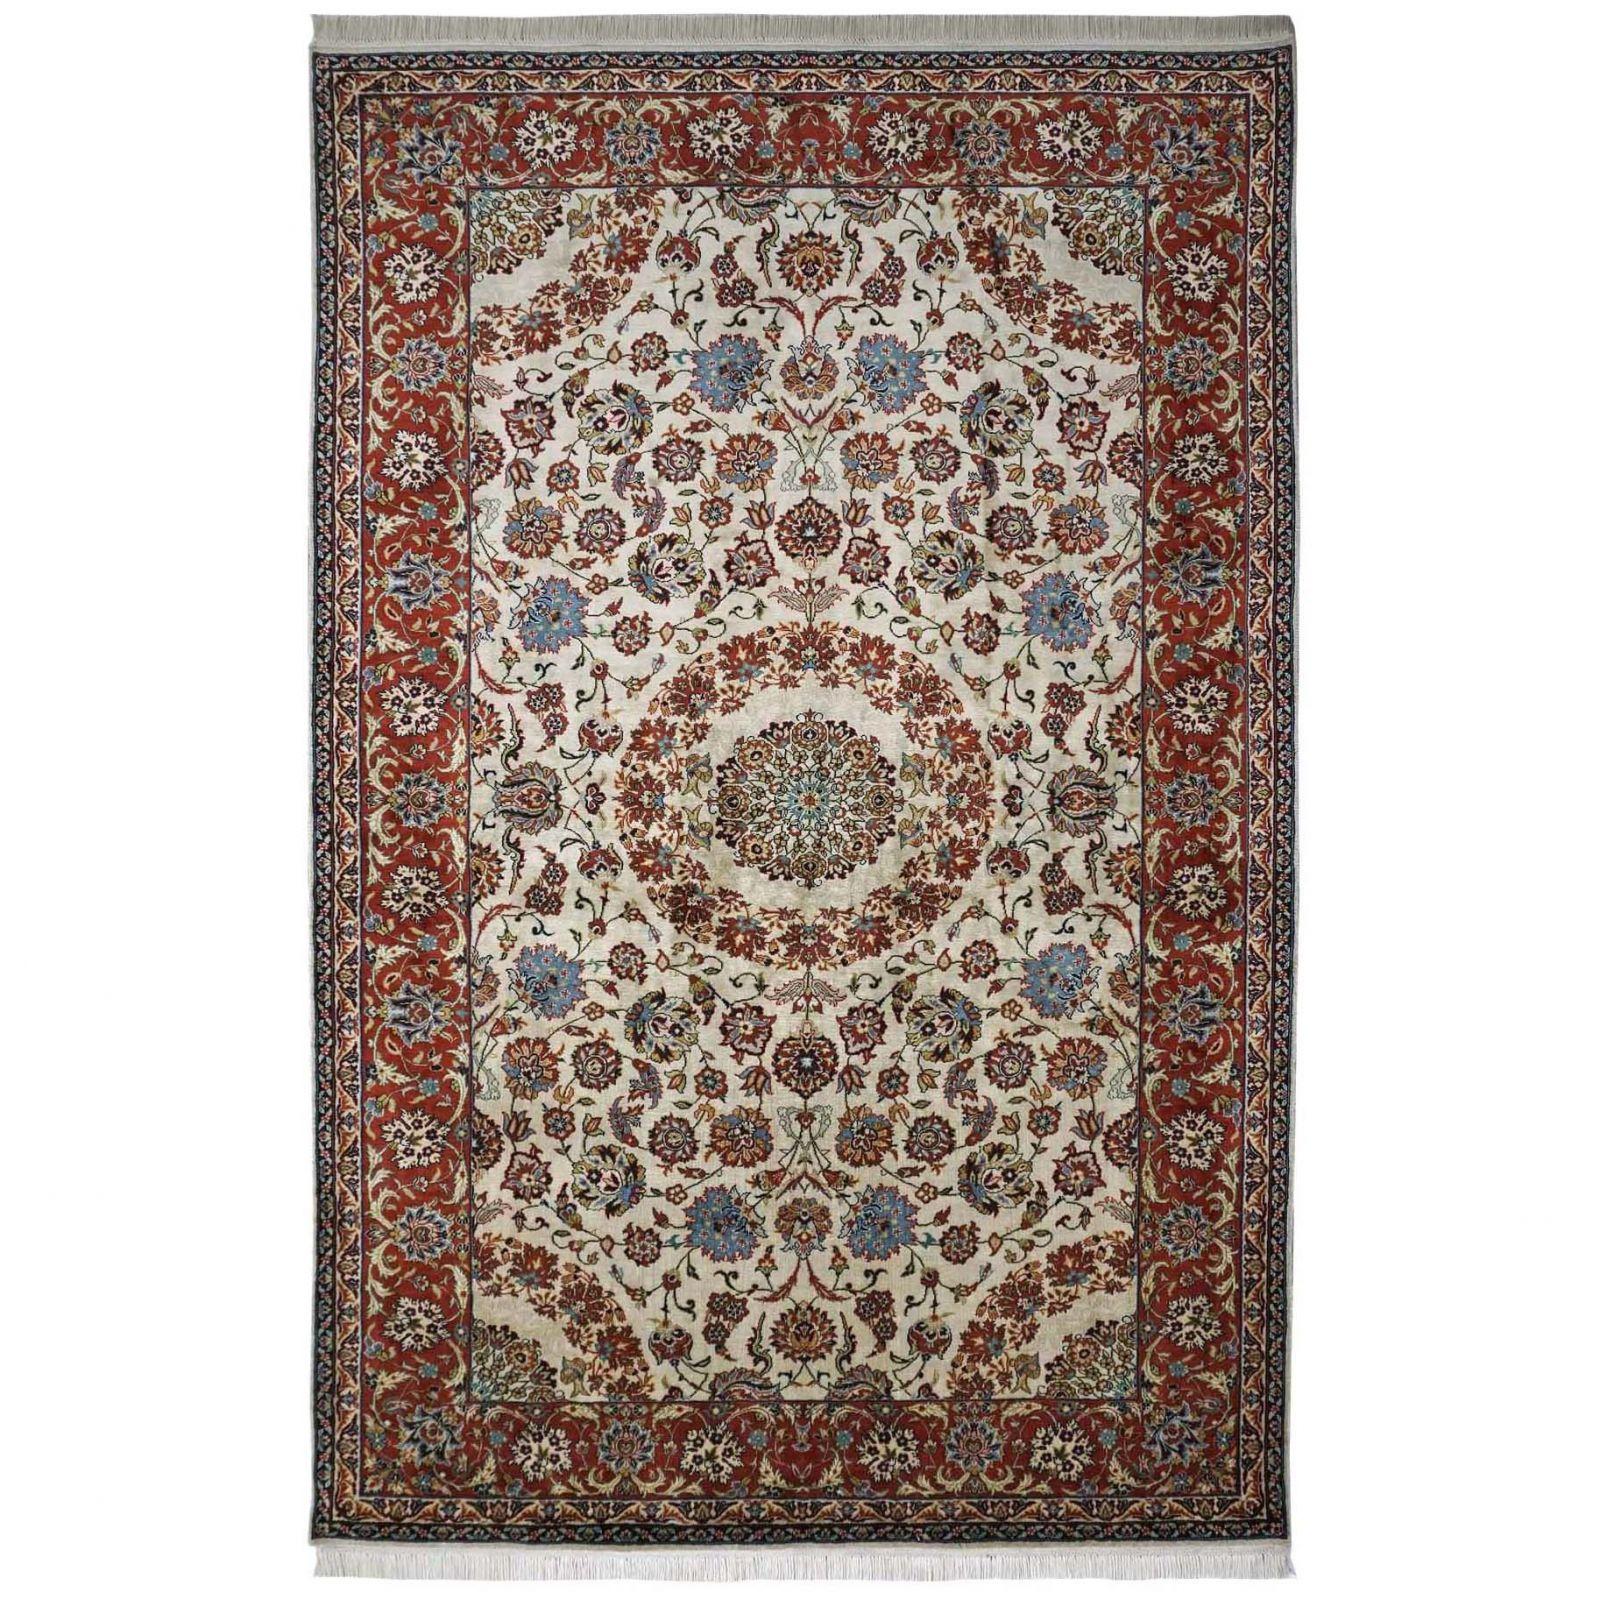 Isfahan design silk pile carpet